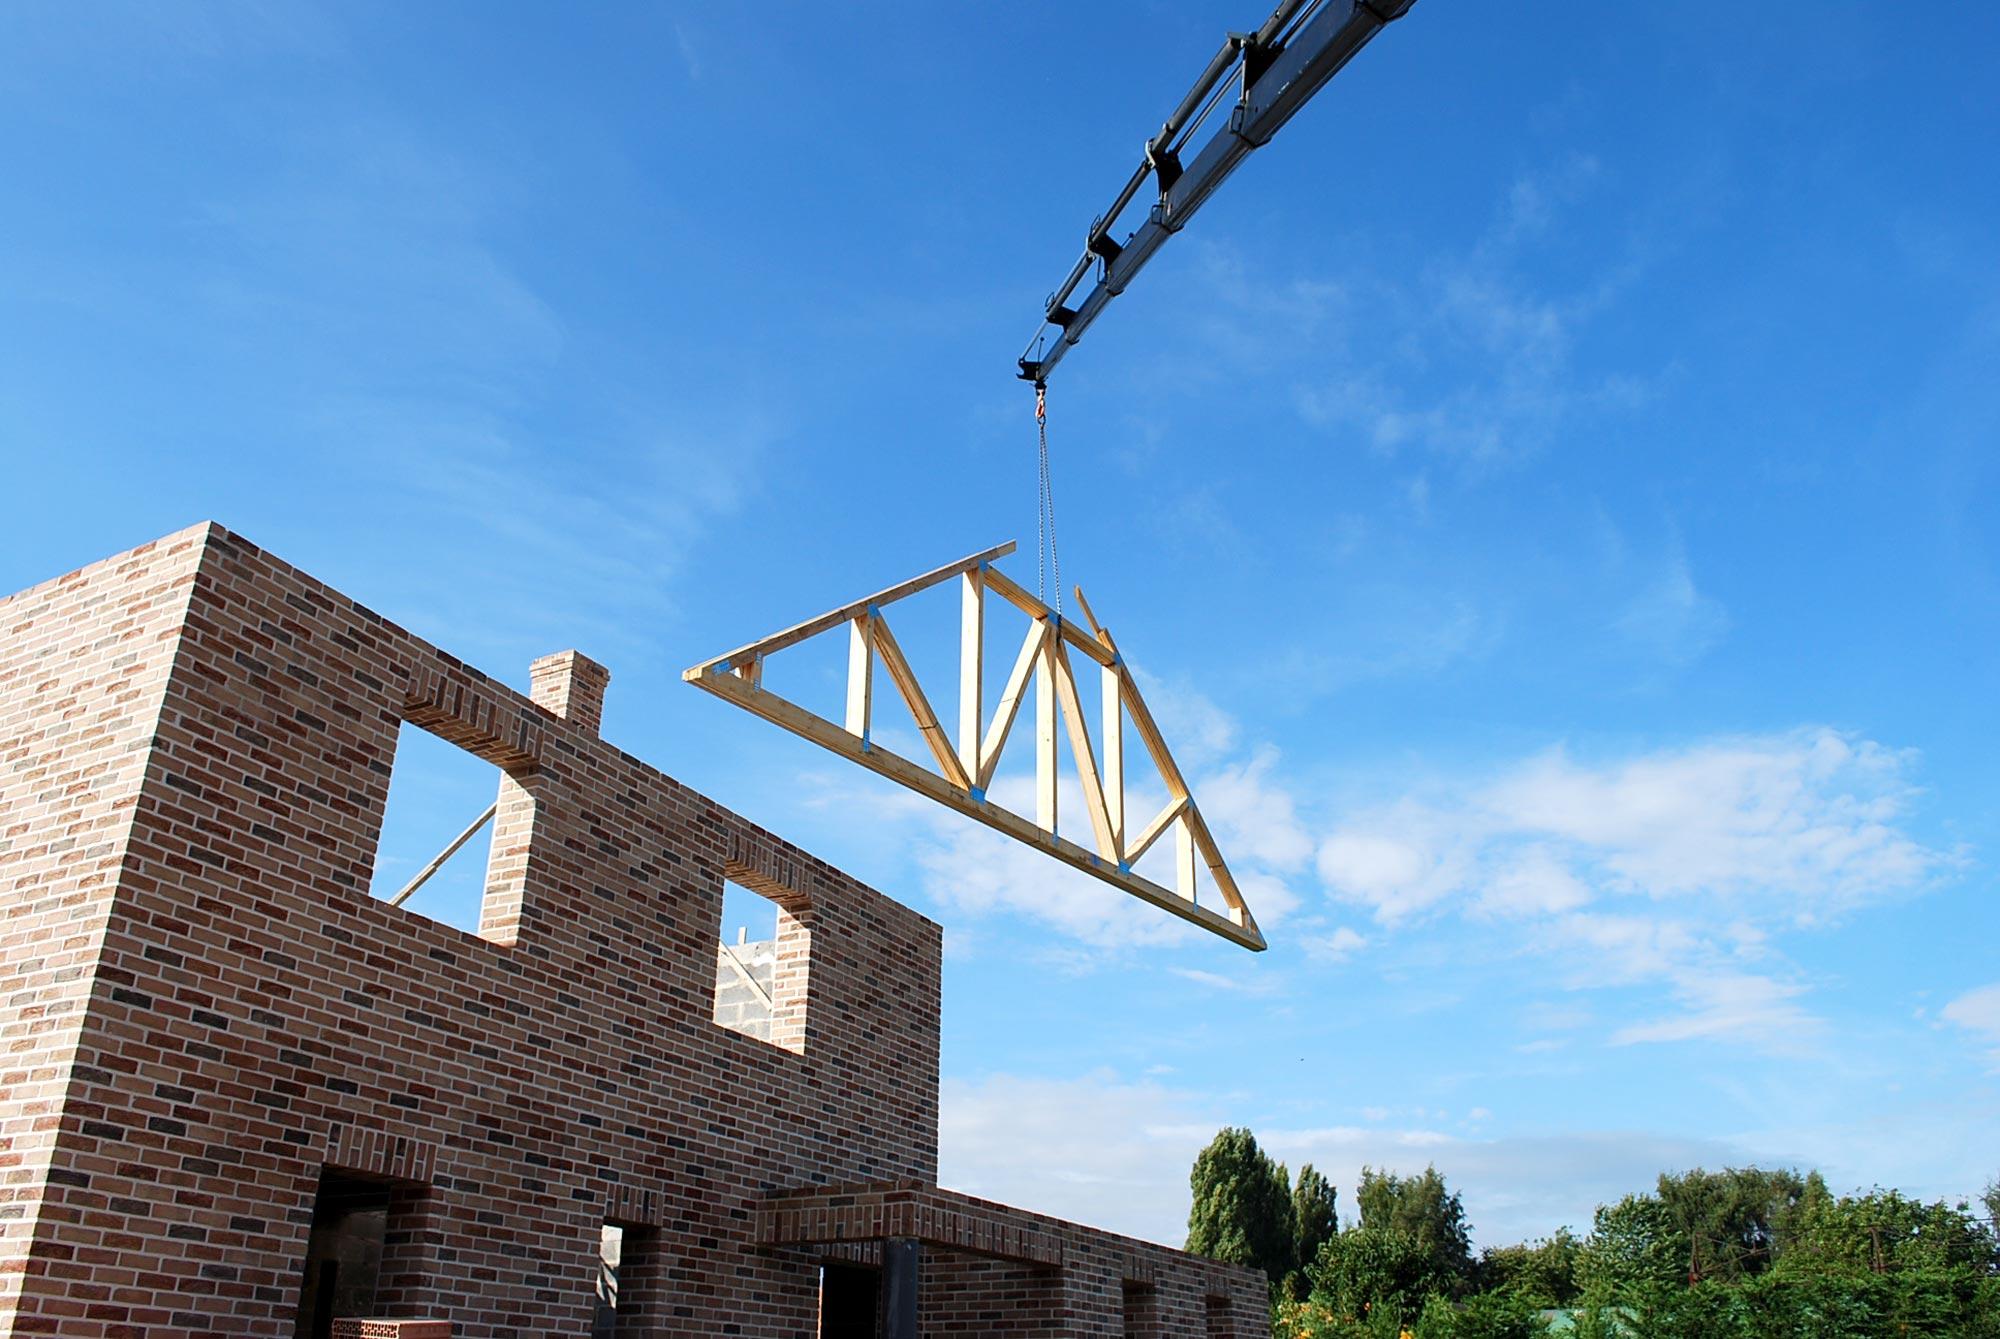 Constructeur maison serieux nord pas de calais for Constructeur de maison individuelle nord pas de calais